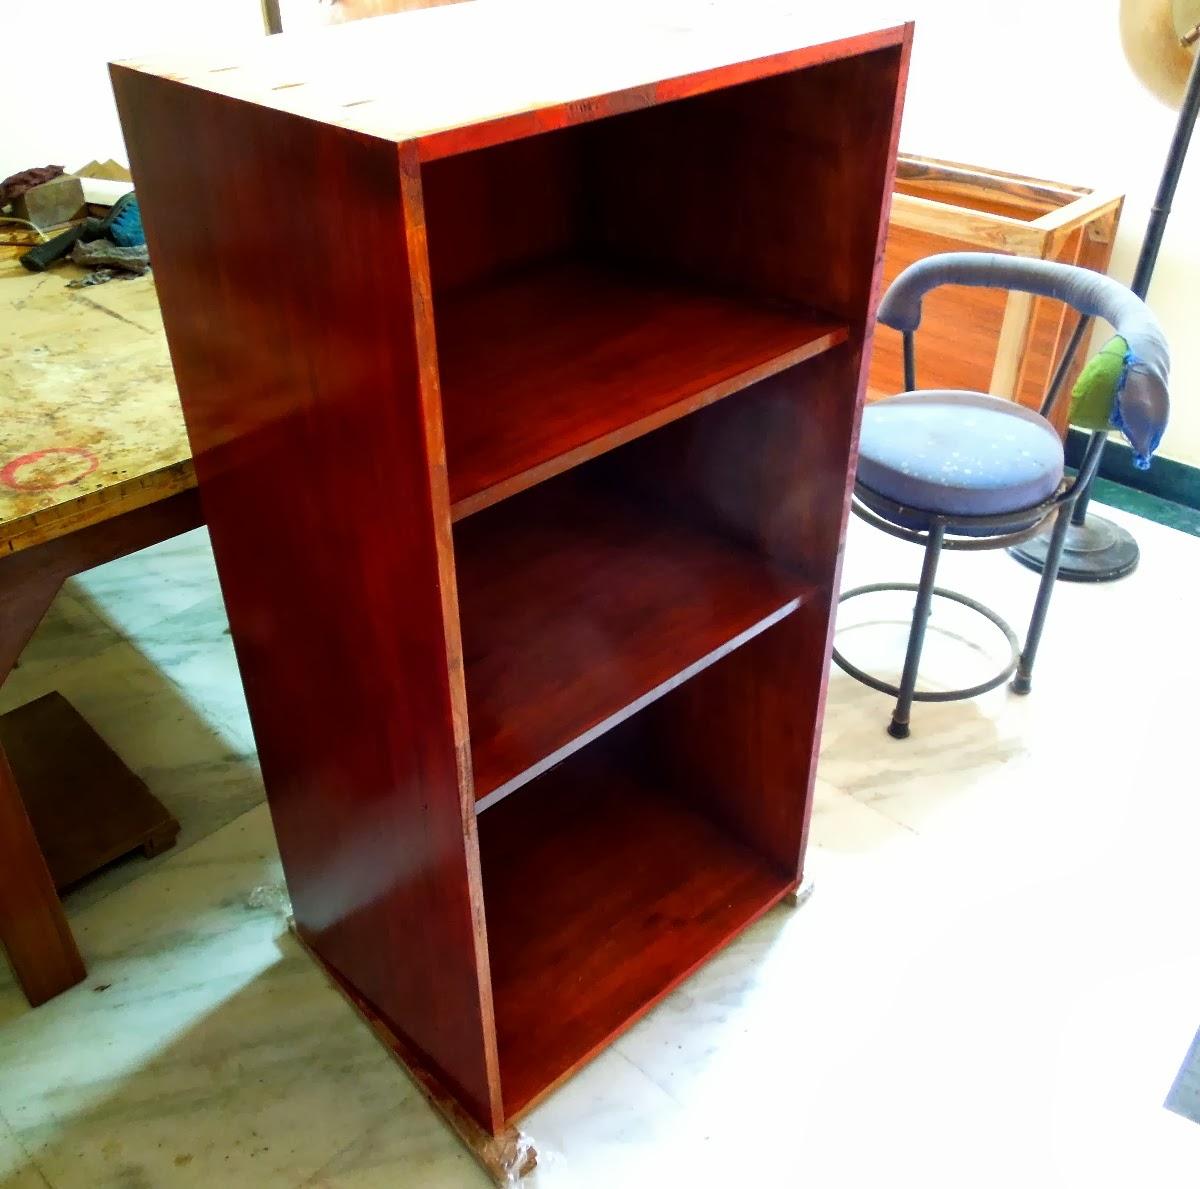 Project Quick Bookshelf With Pocket Hole Screws